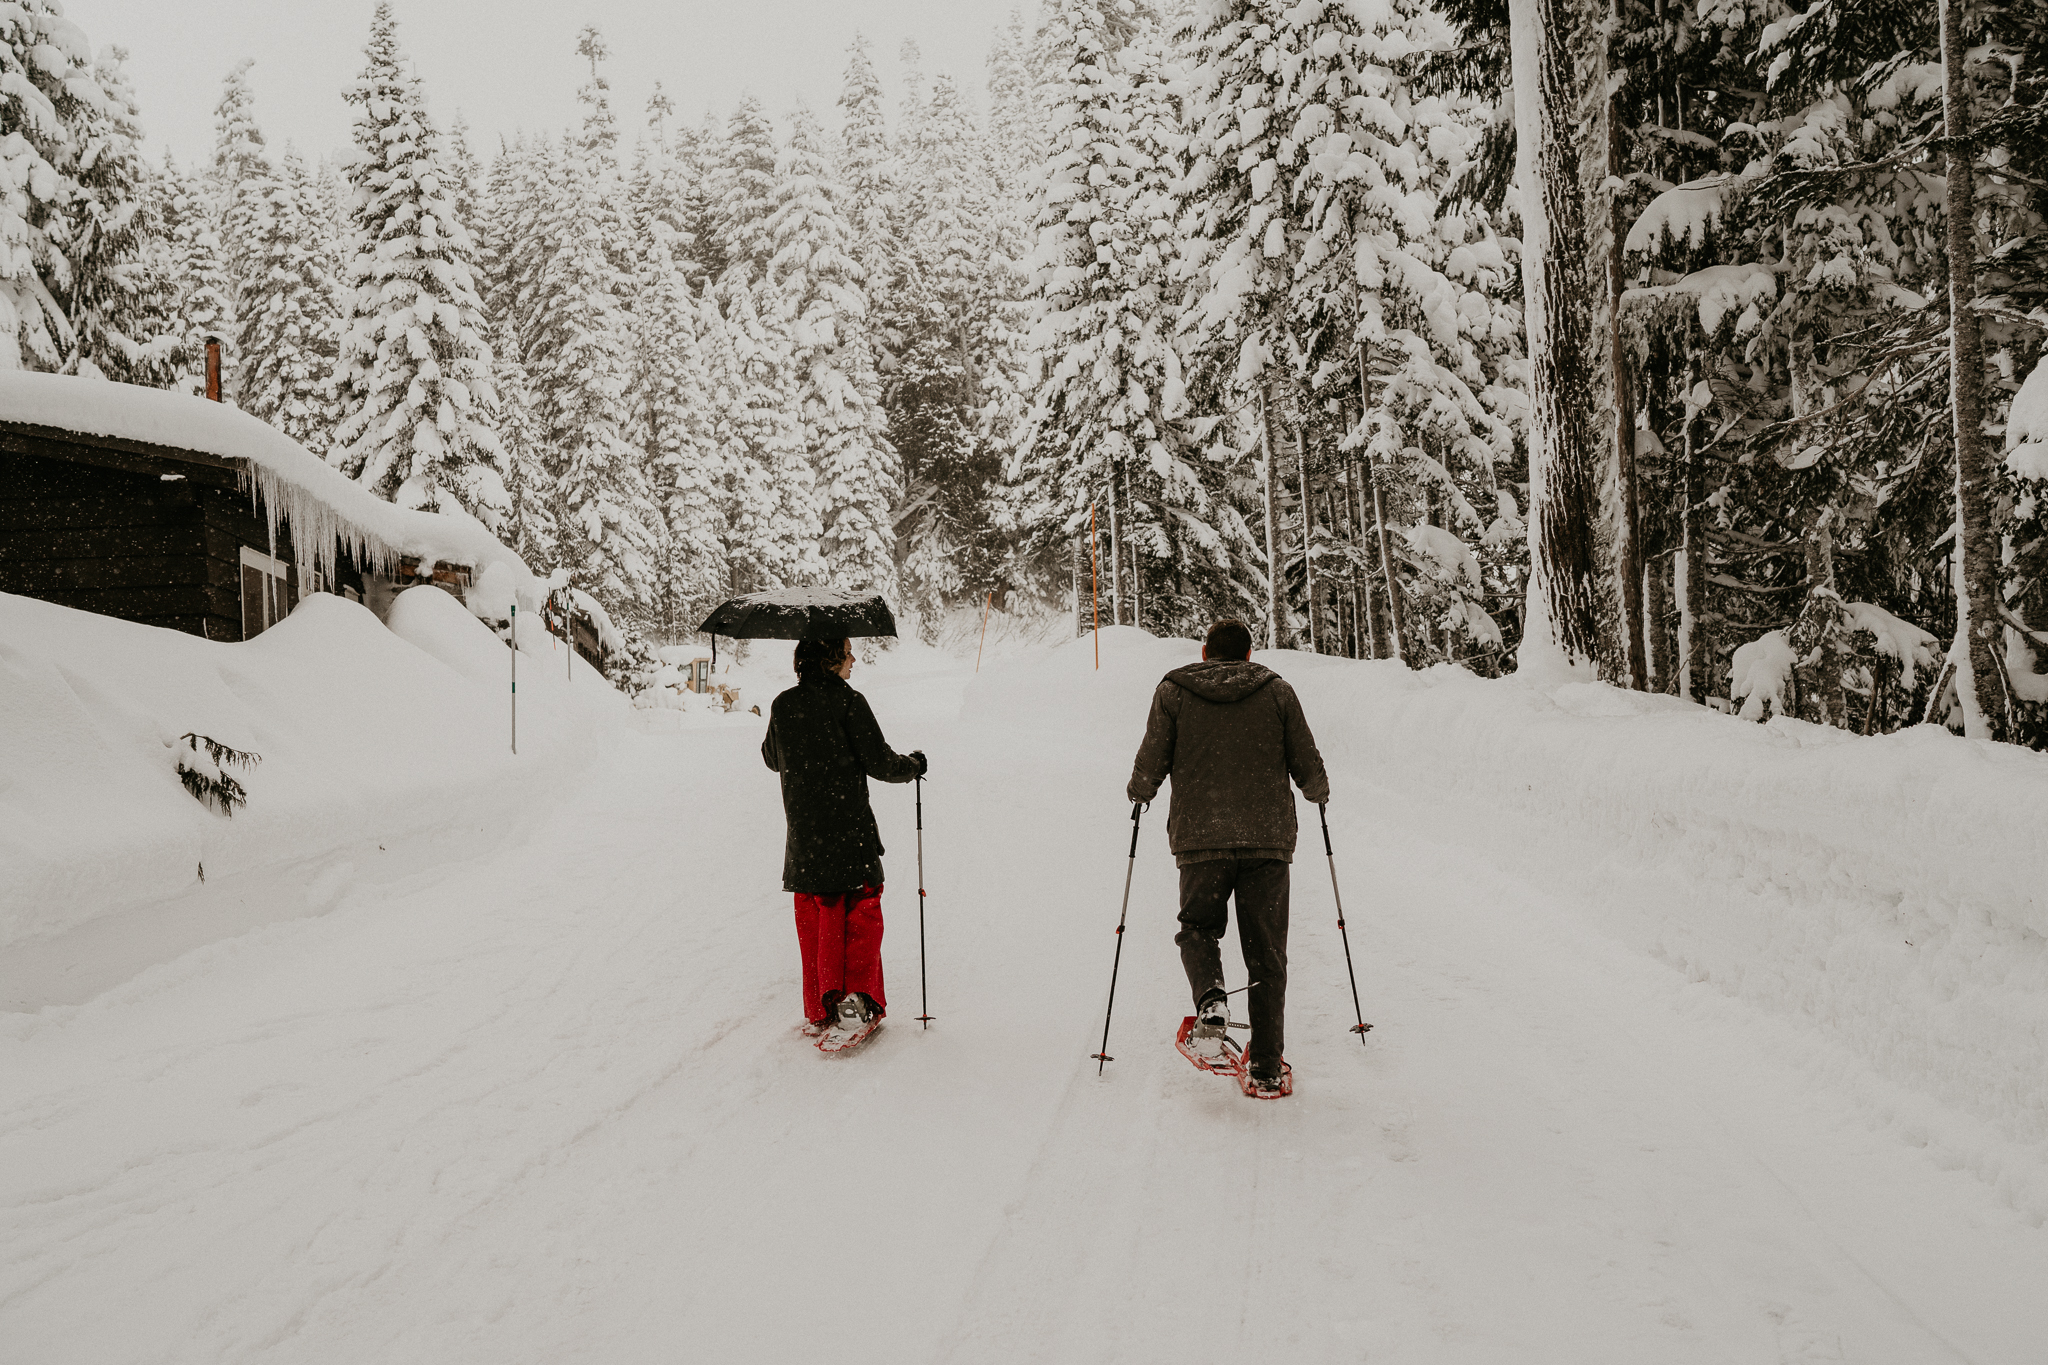 Mount-Rainier-Snow-Winter-Elopement-Adventure-Photographer2-56.jpg